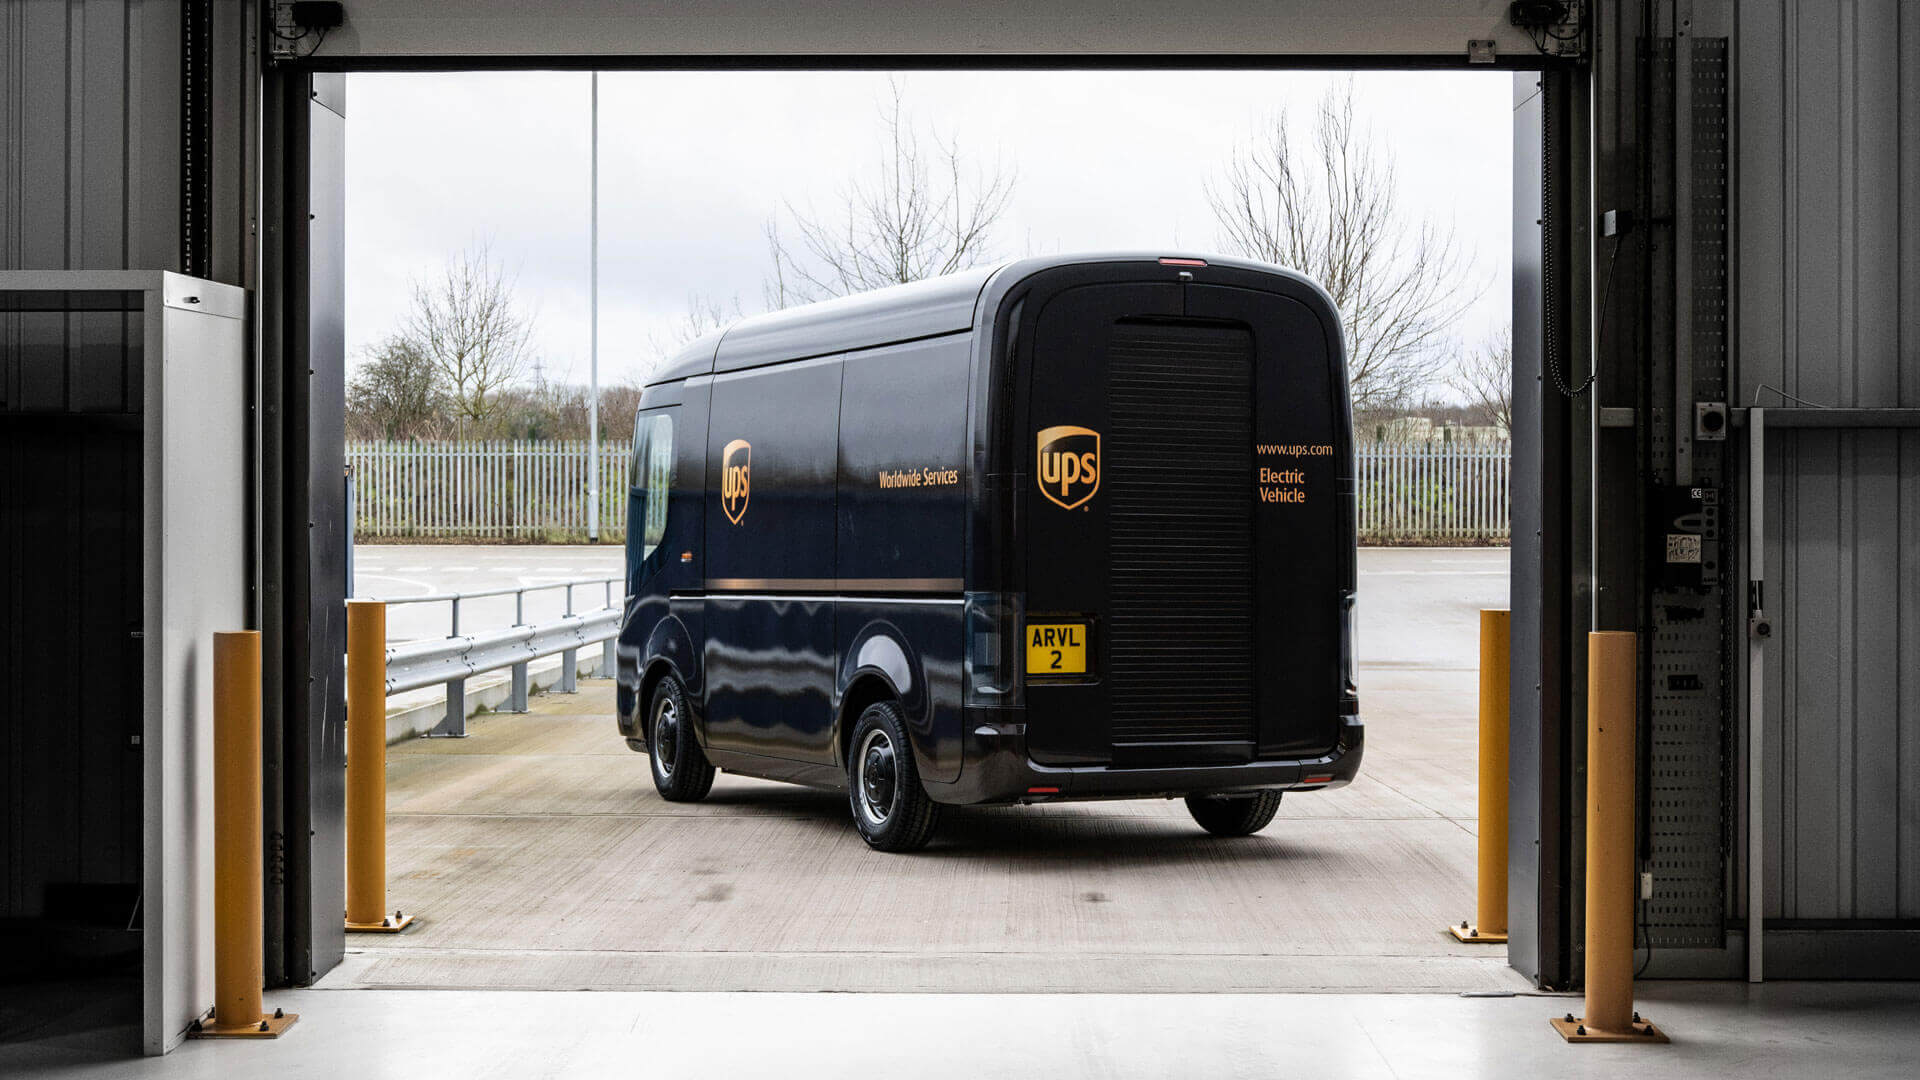 Электрический грузовик Arrival для UPS